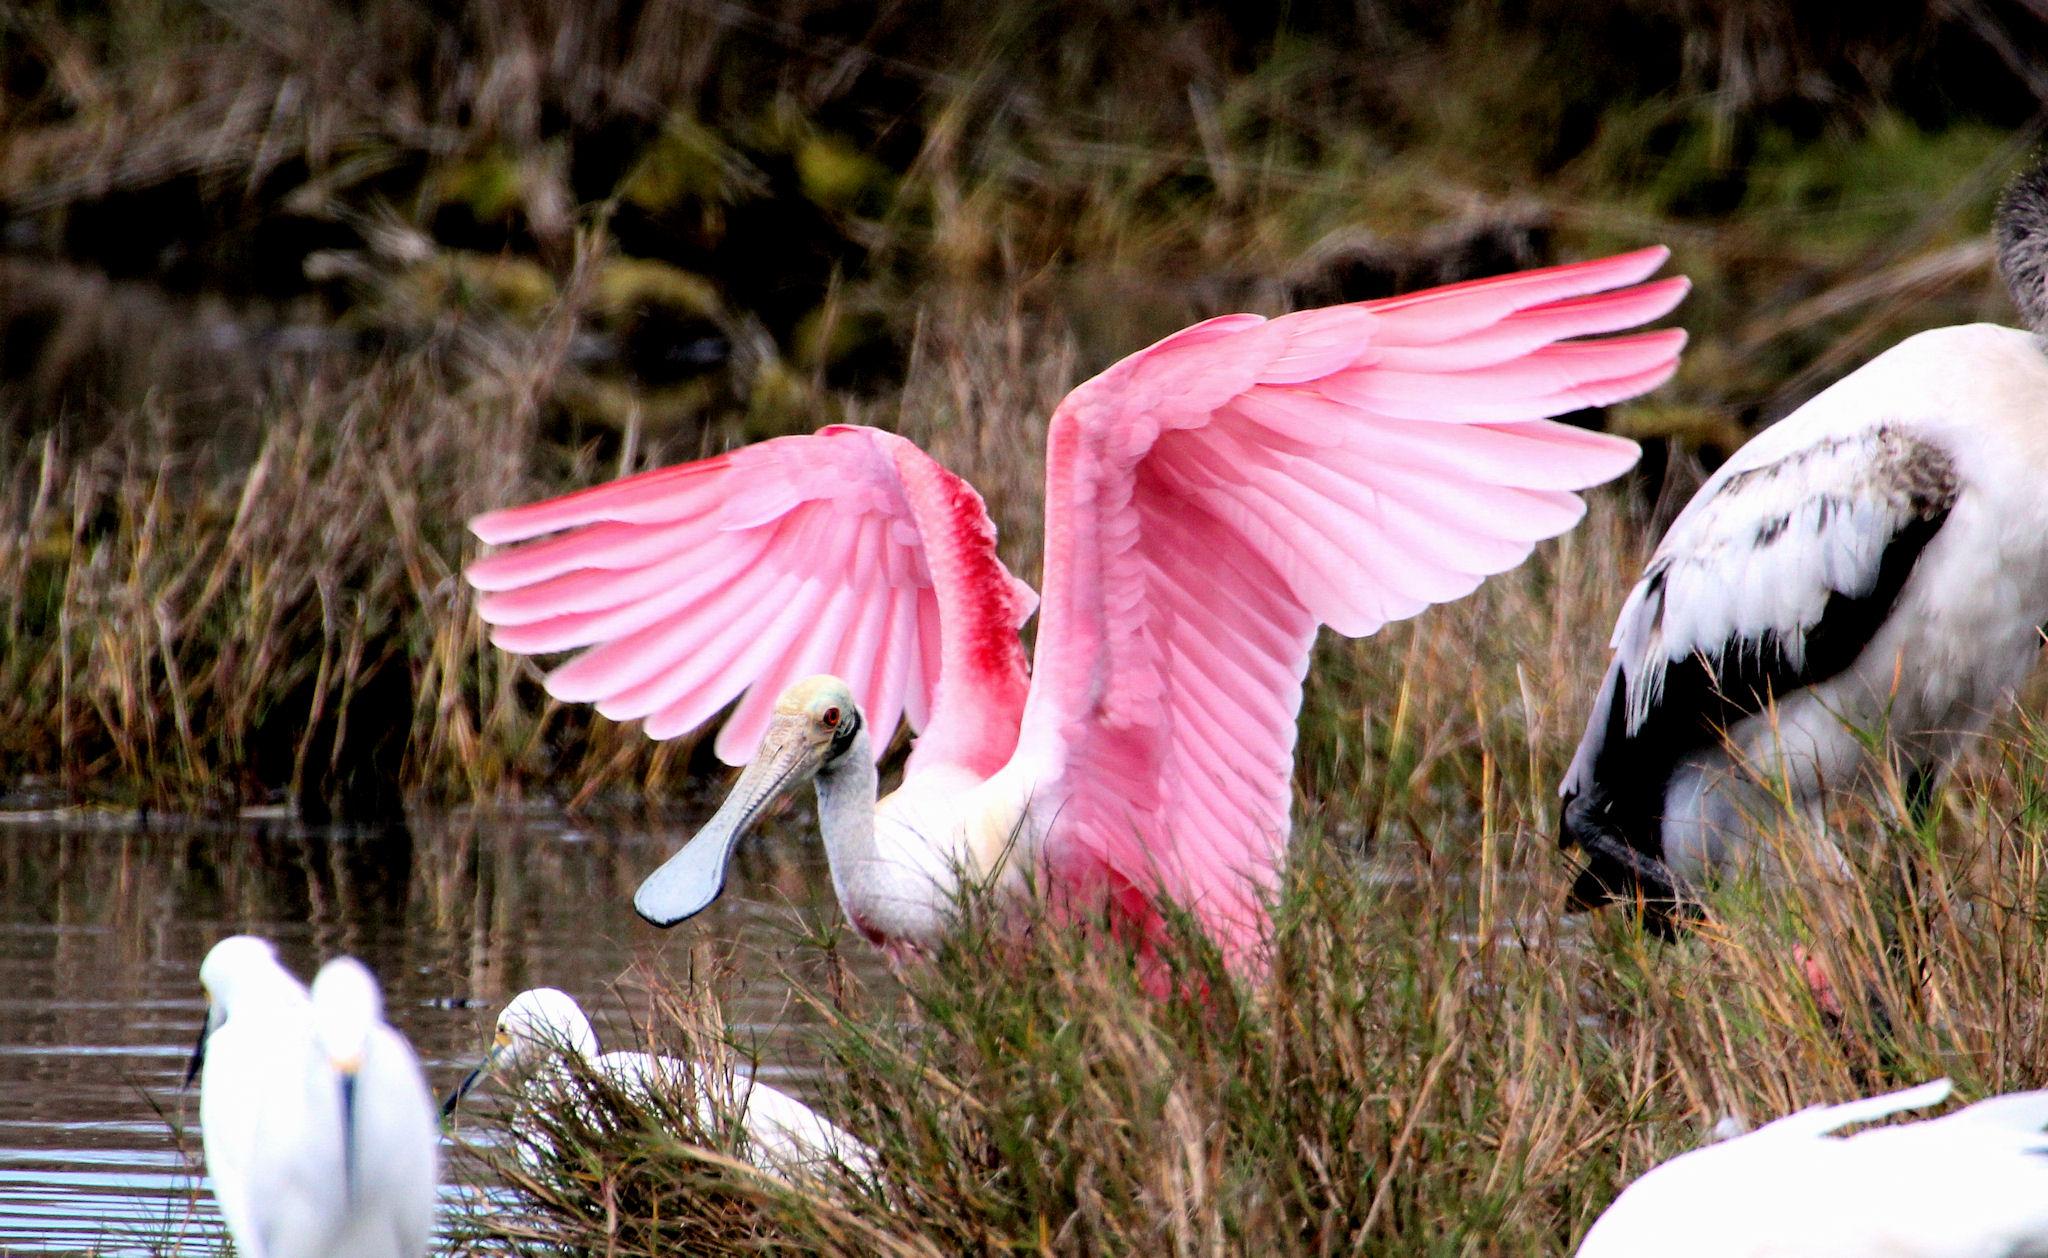 https://i0.wp.com/www.gregmillerbirding.com/wp-content/uploads/2013/02/Roseate-Spoonbill-wings-raised-Merritt-Island-NWR-near-Titusville-FL-2013-01-29-IMG_7135.jpg